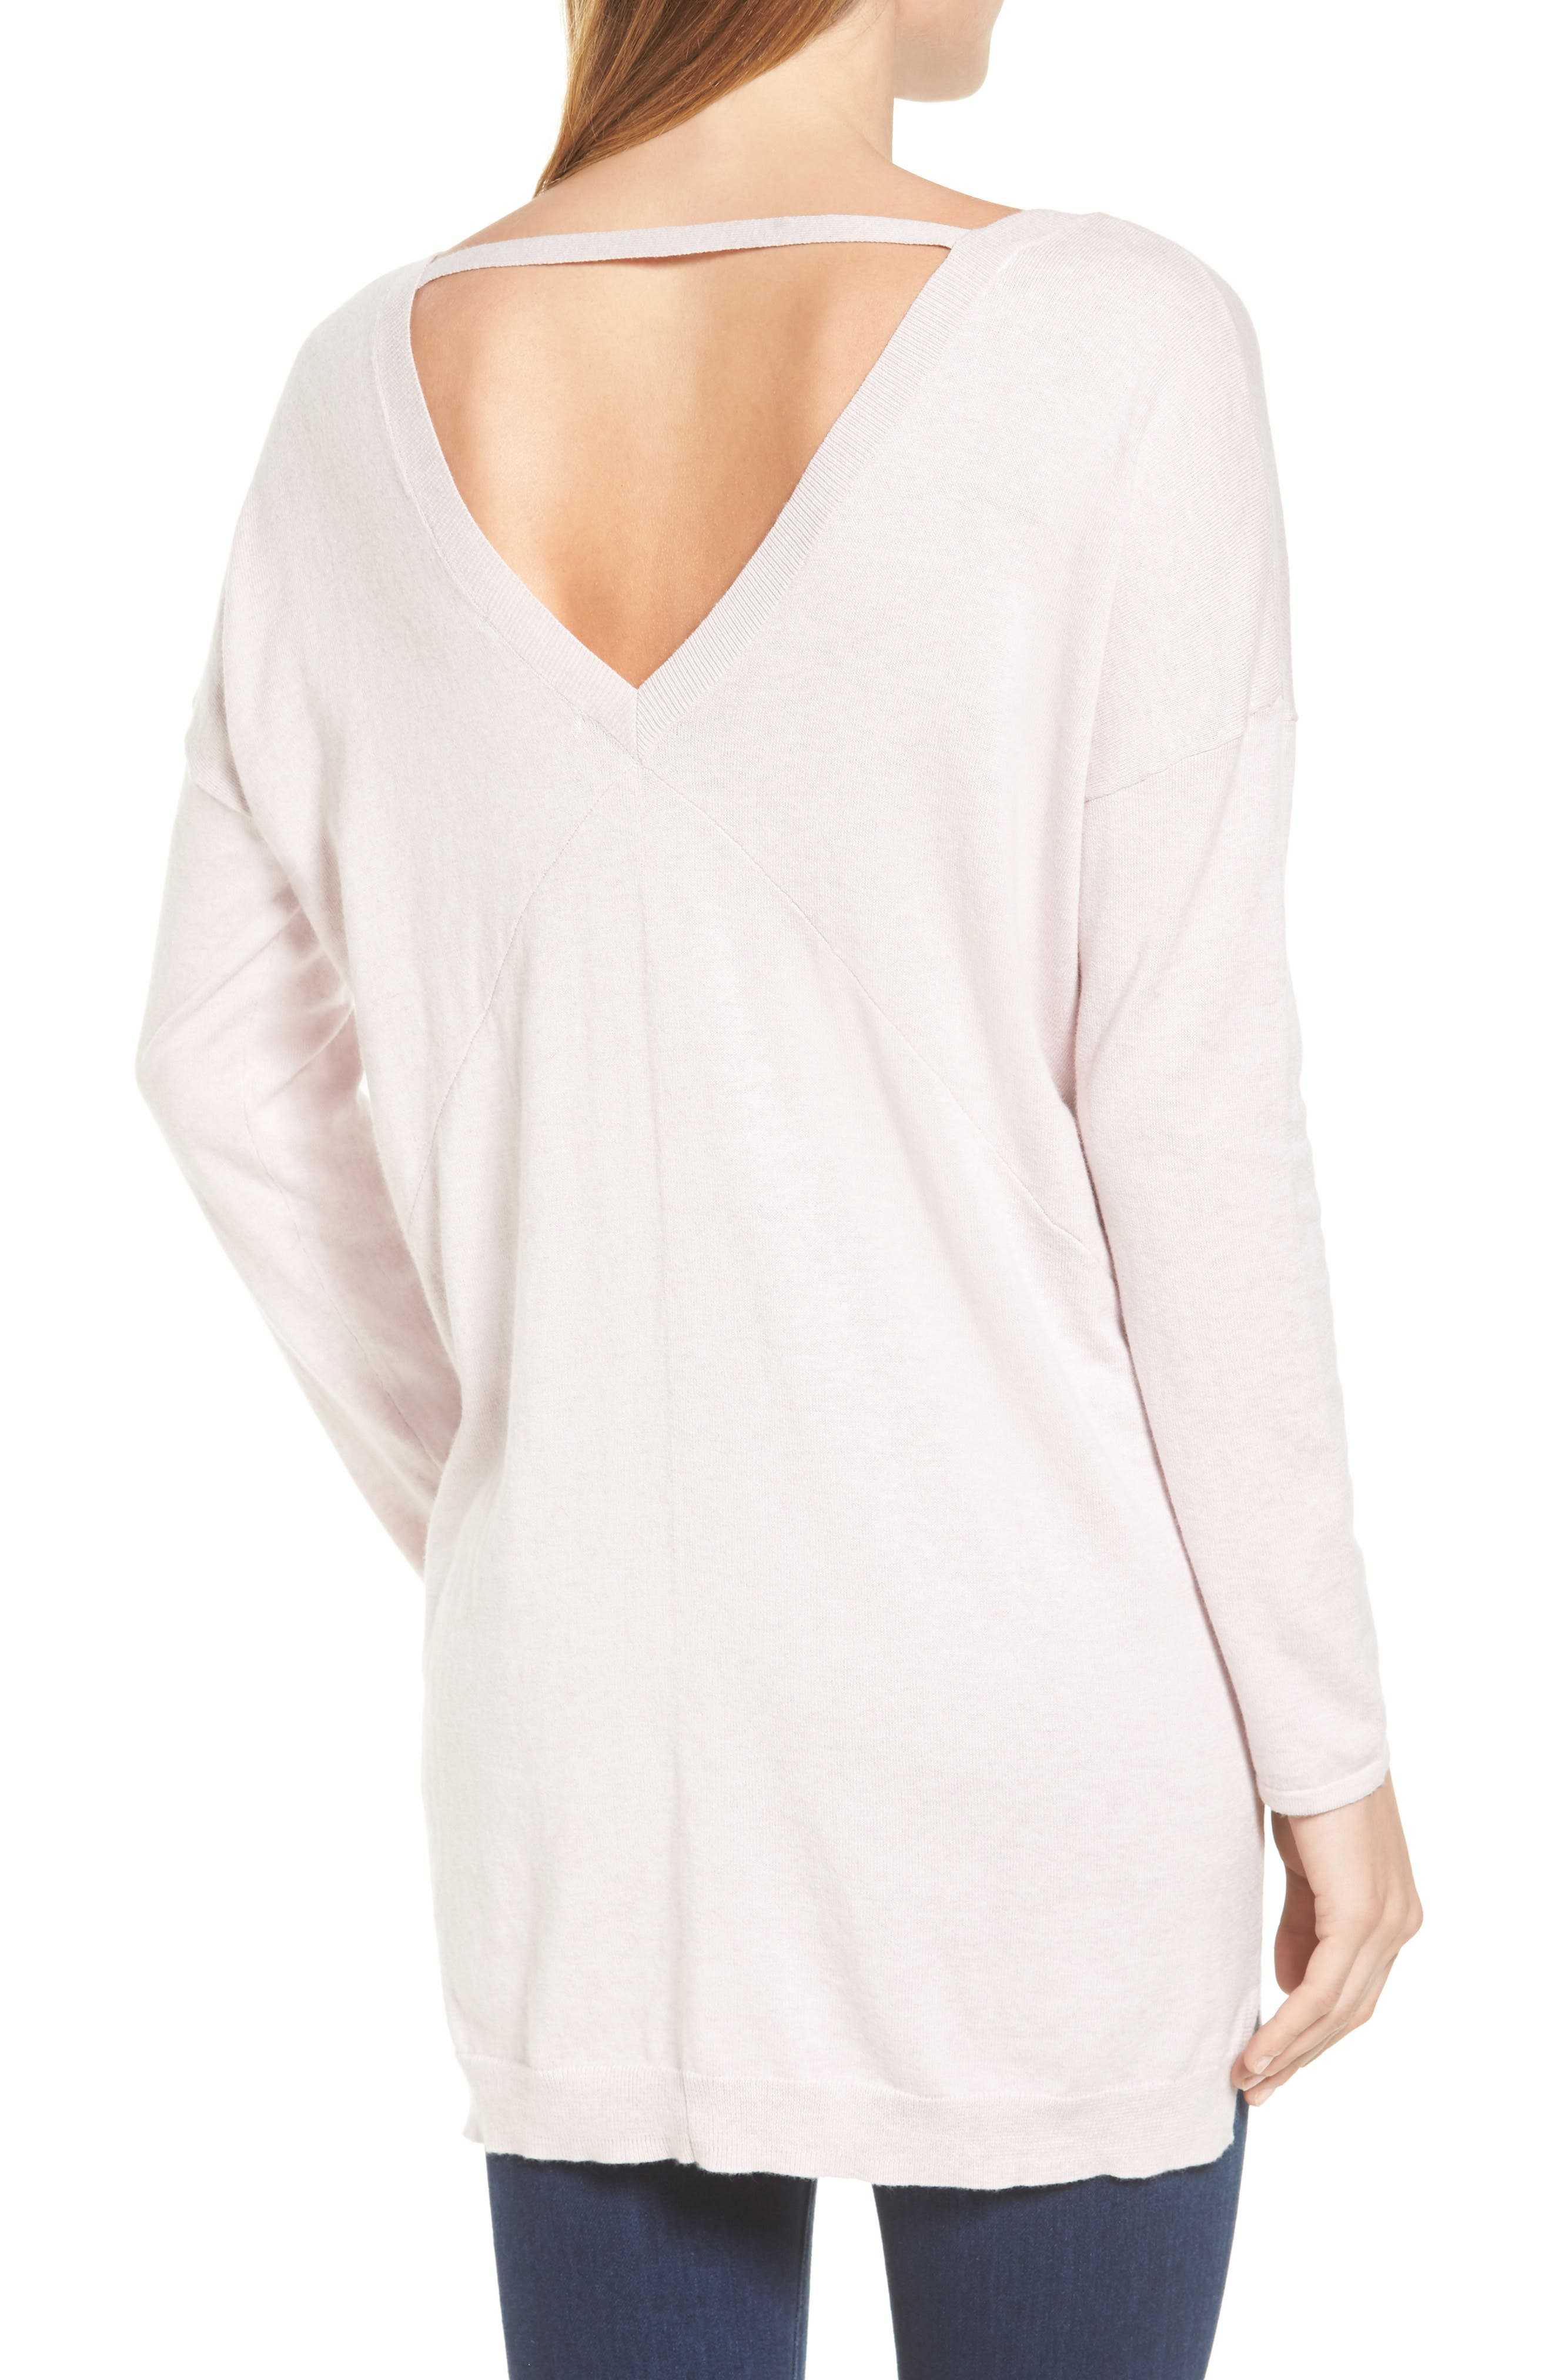 Alternate Image 2  - Tart Maternity Abella Maternity Sweater